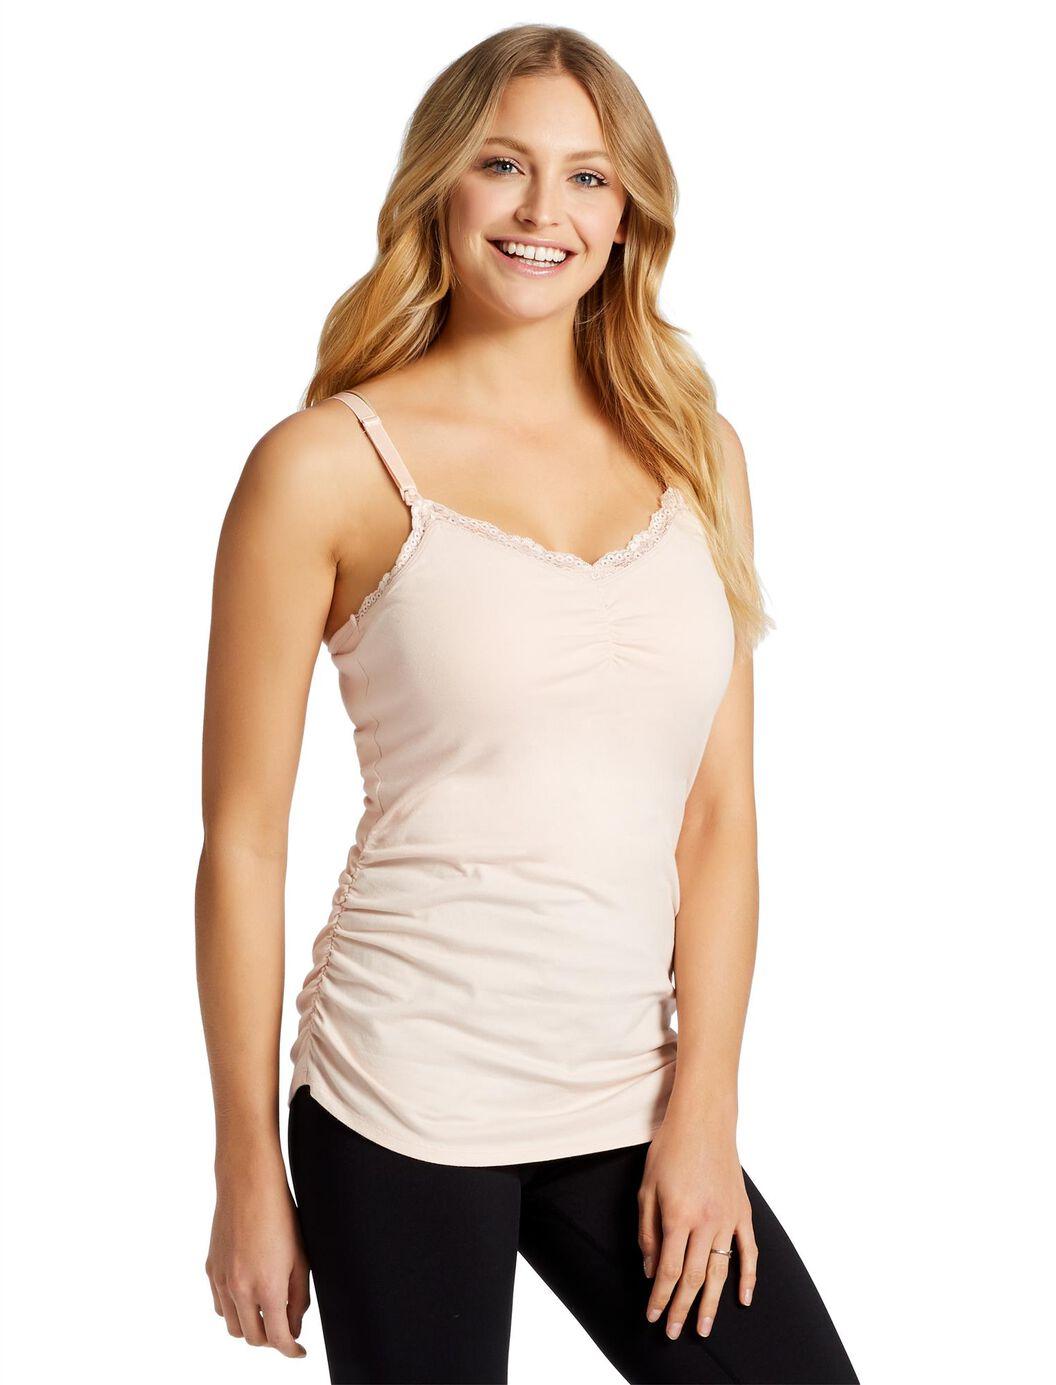 Jessica Simpson Clip Down Shelf Bra Nursing Cami- Solid at Motherhood Maternity in Victor, NY | Tuggl